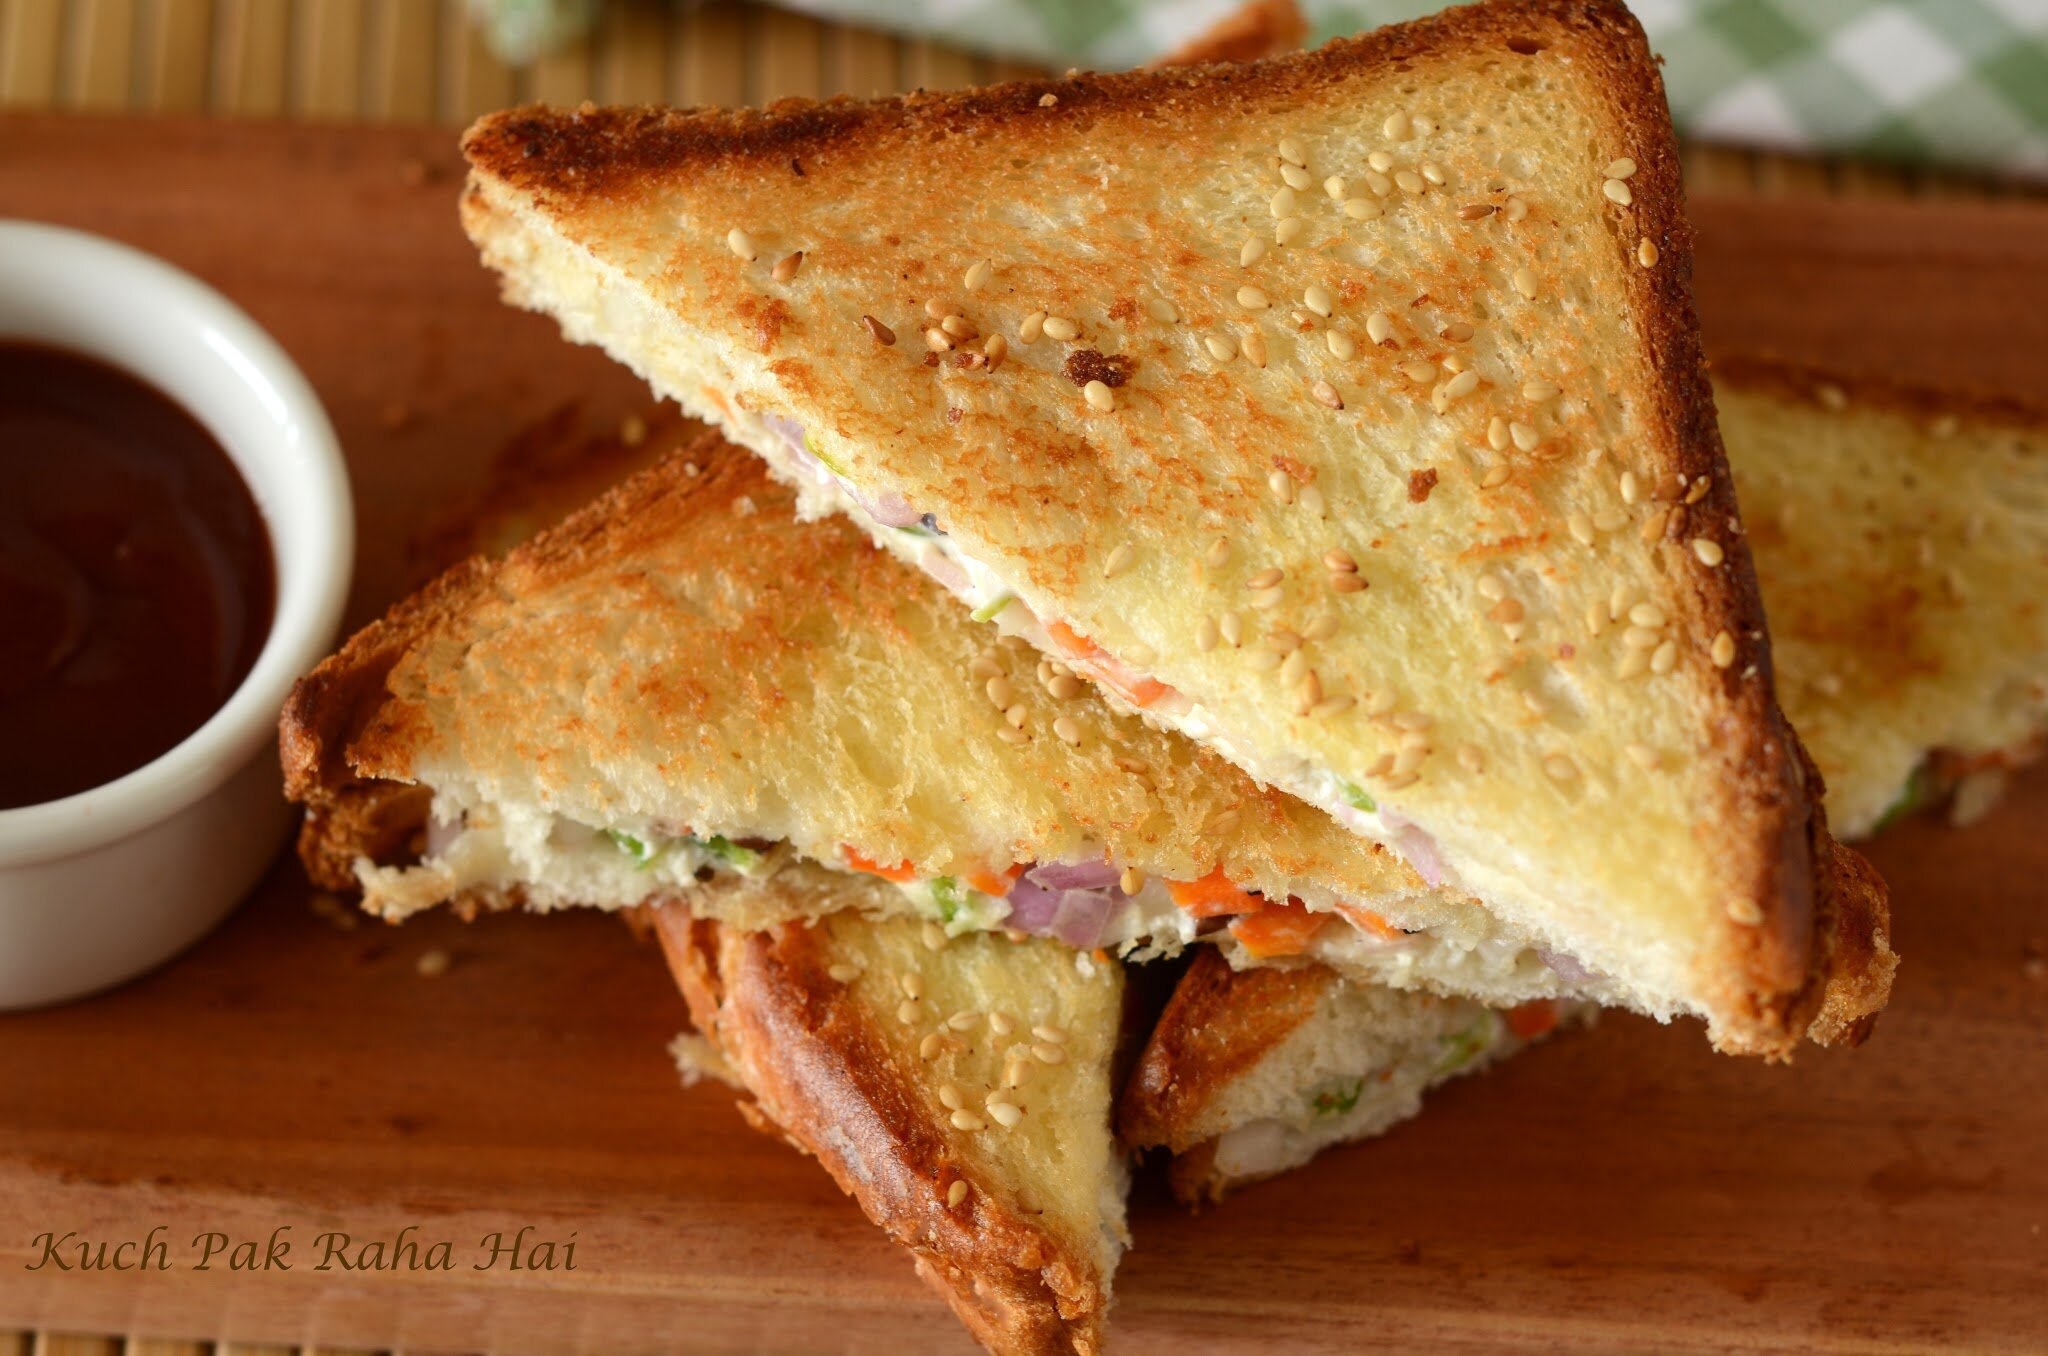 Curd Sandwich recipe Yoghurt Sandwich made with hung curd for breakfast kids lunch box sandwich recipe